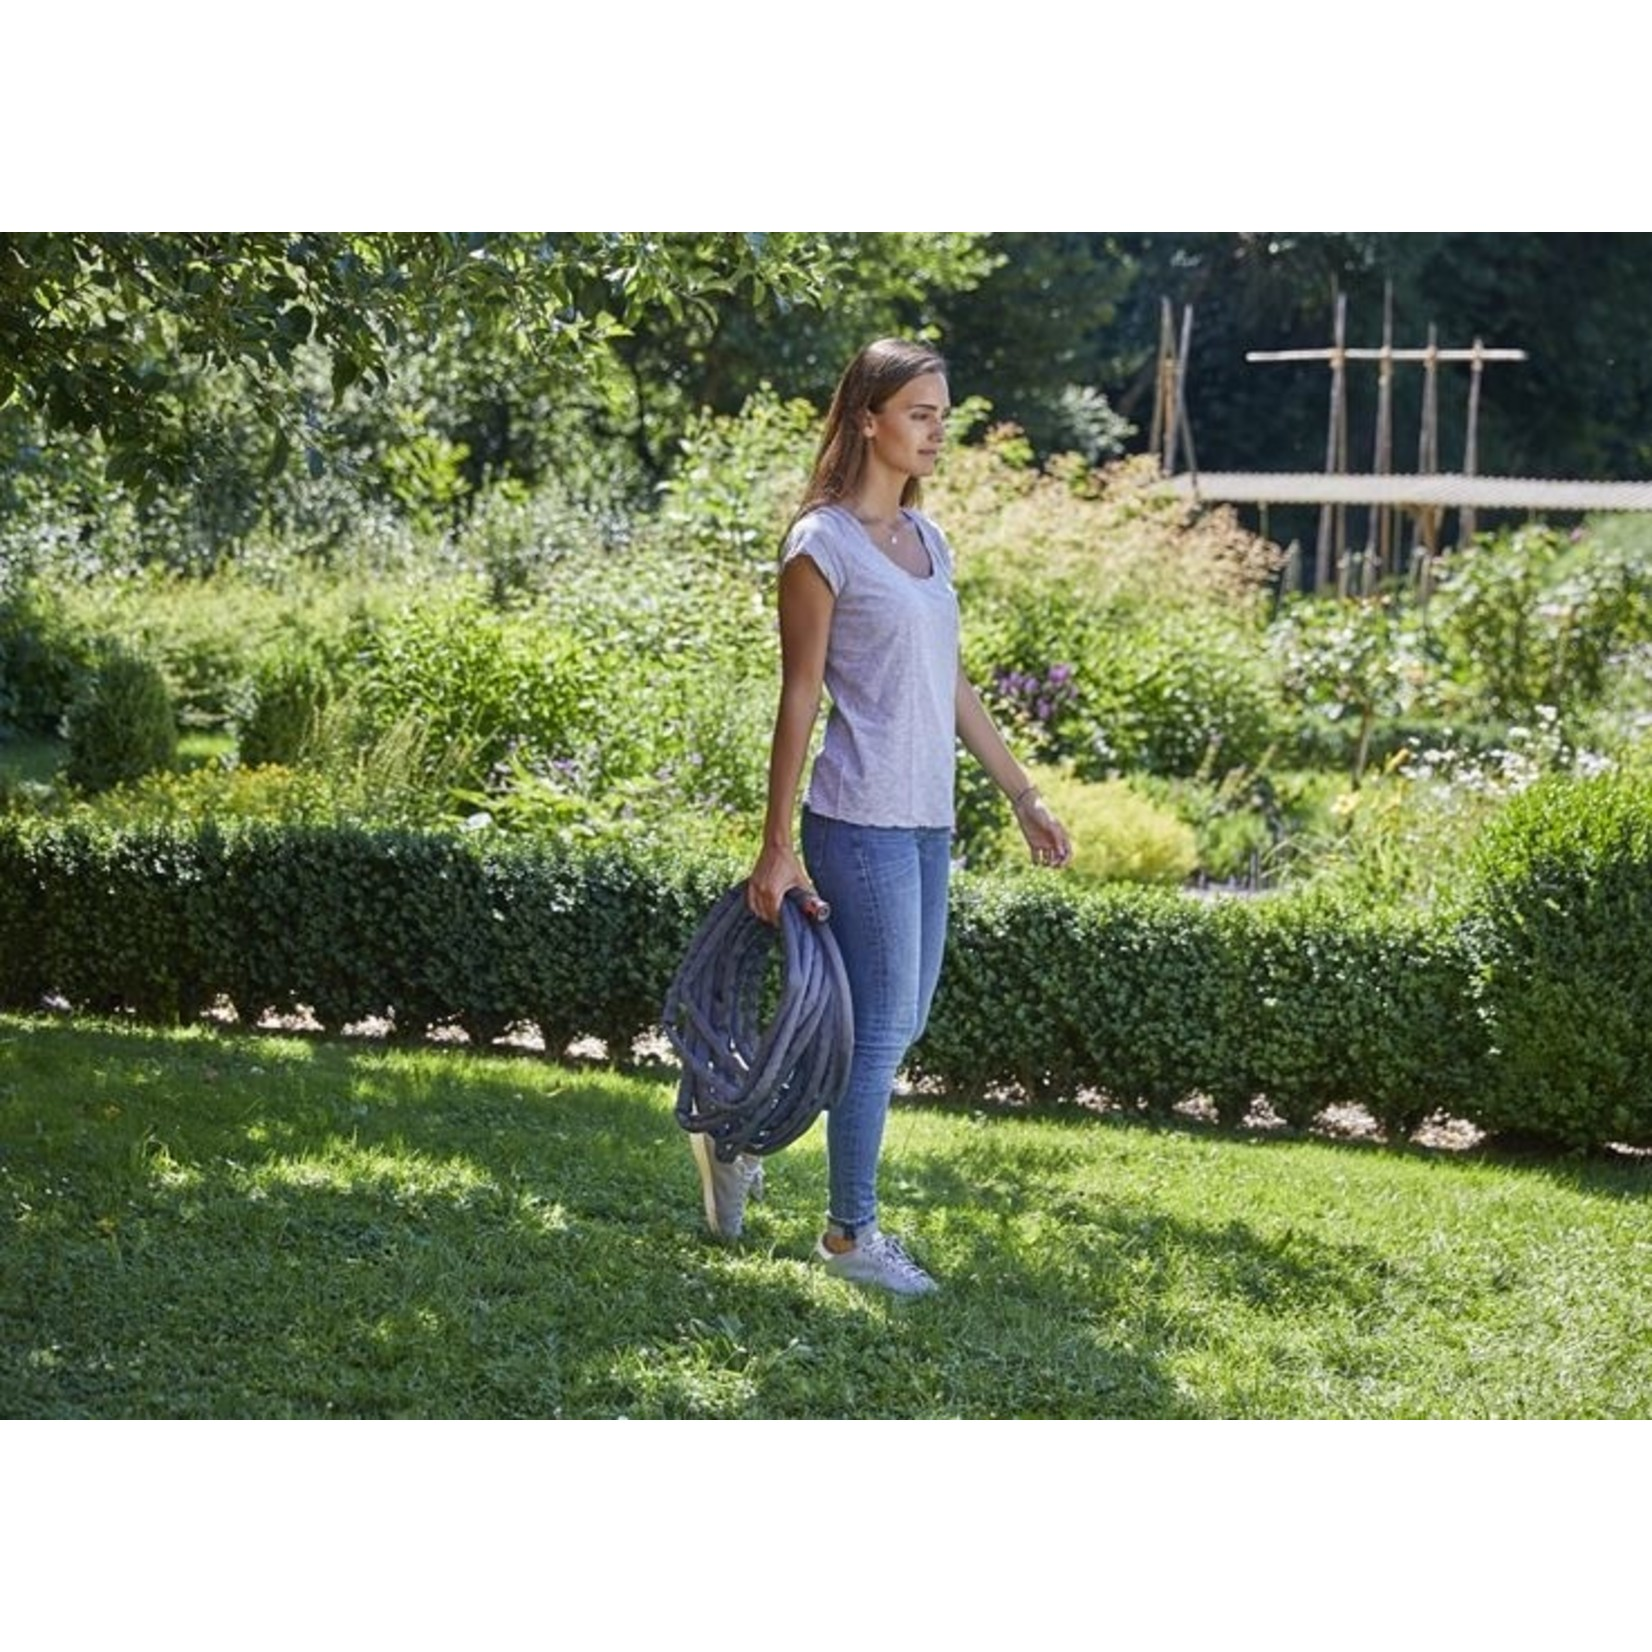 Gardena Gardena Textielslang Liano 10 m Set